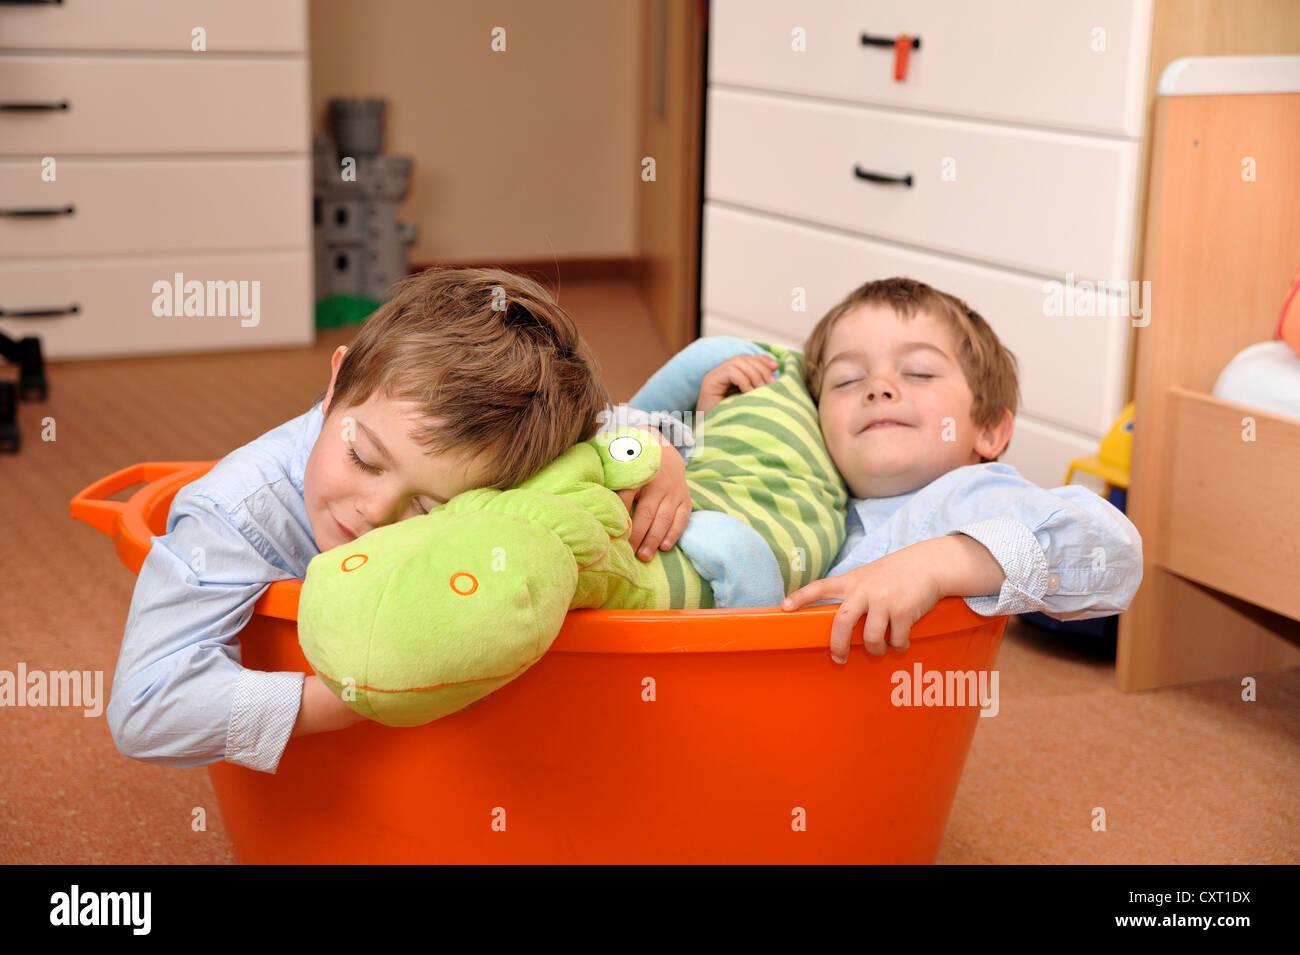 Three Boys In Bathtub Stock Photos & Three Boys In Bathtub Stock ...